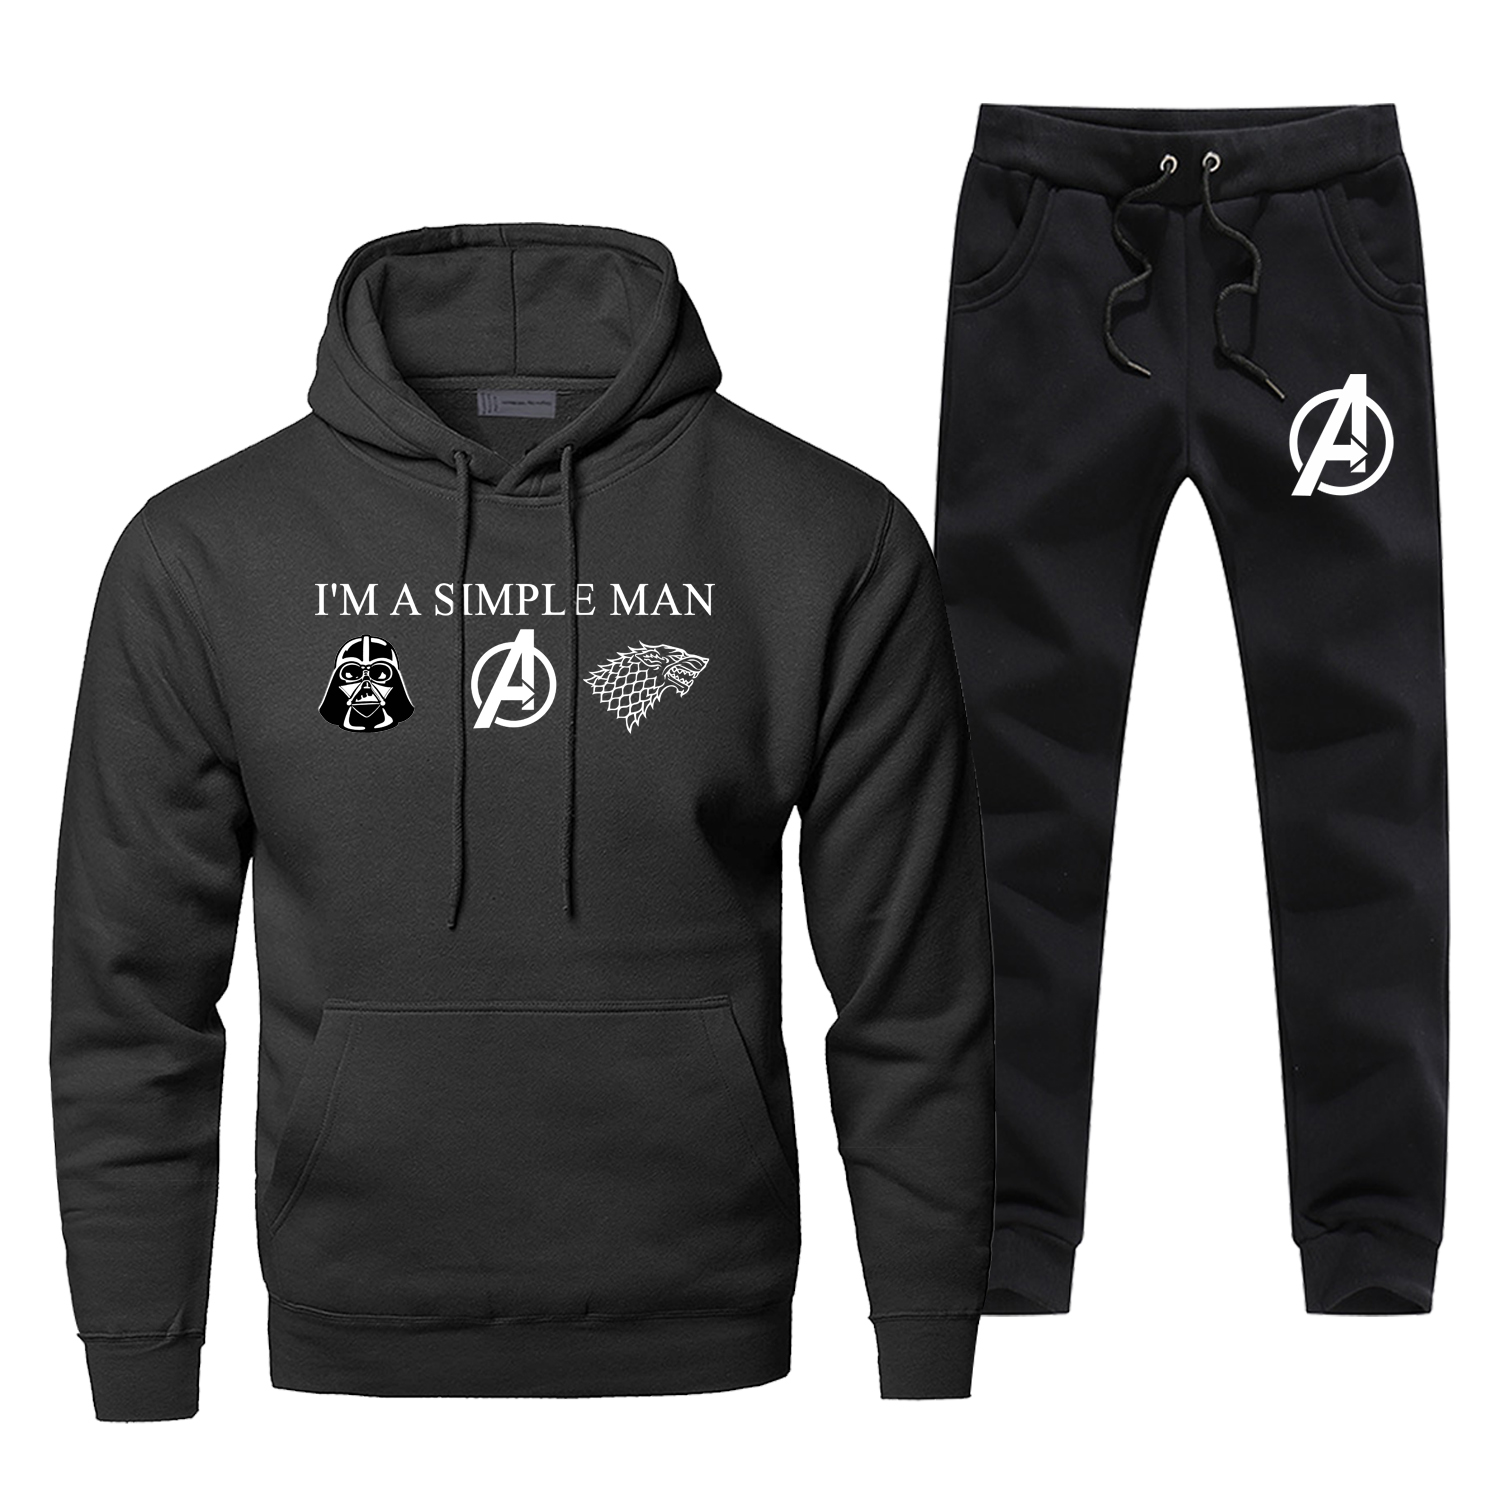 I'M A Simple Man Casual Sweatshirt Funny Star Wars Avengers Game Of Thrones Logo Hoodies Pants Sets Men Winter Fleece Streetwear